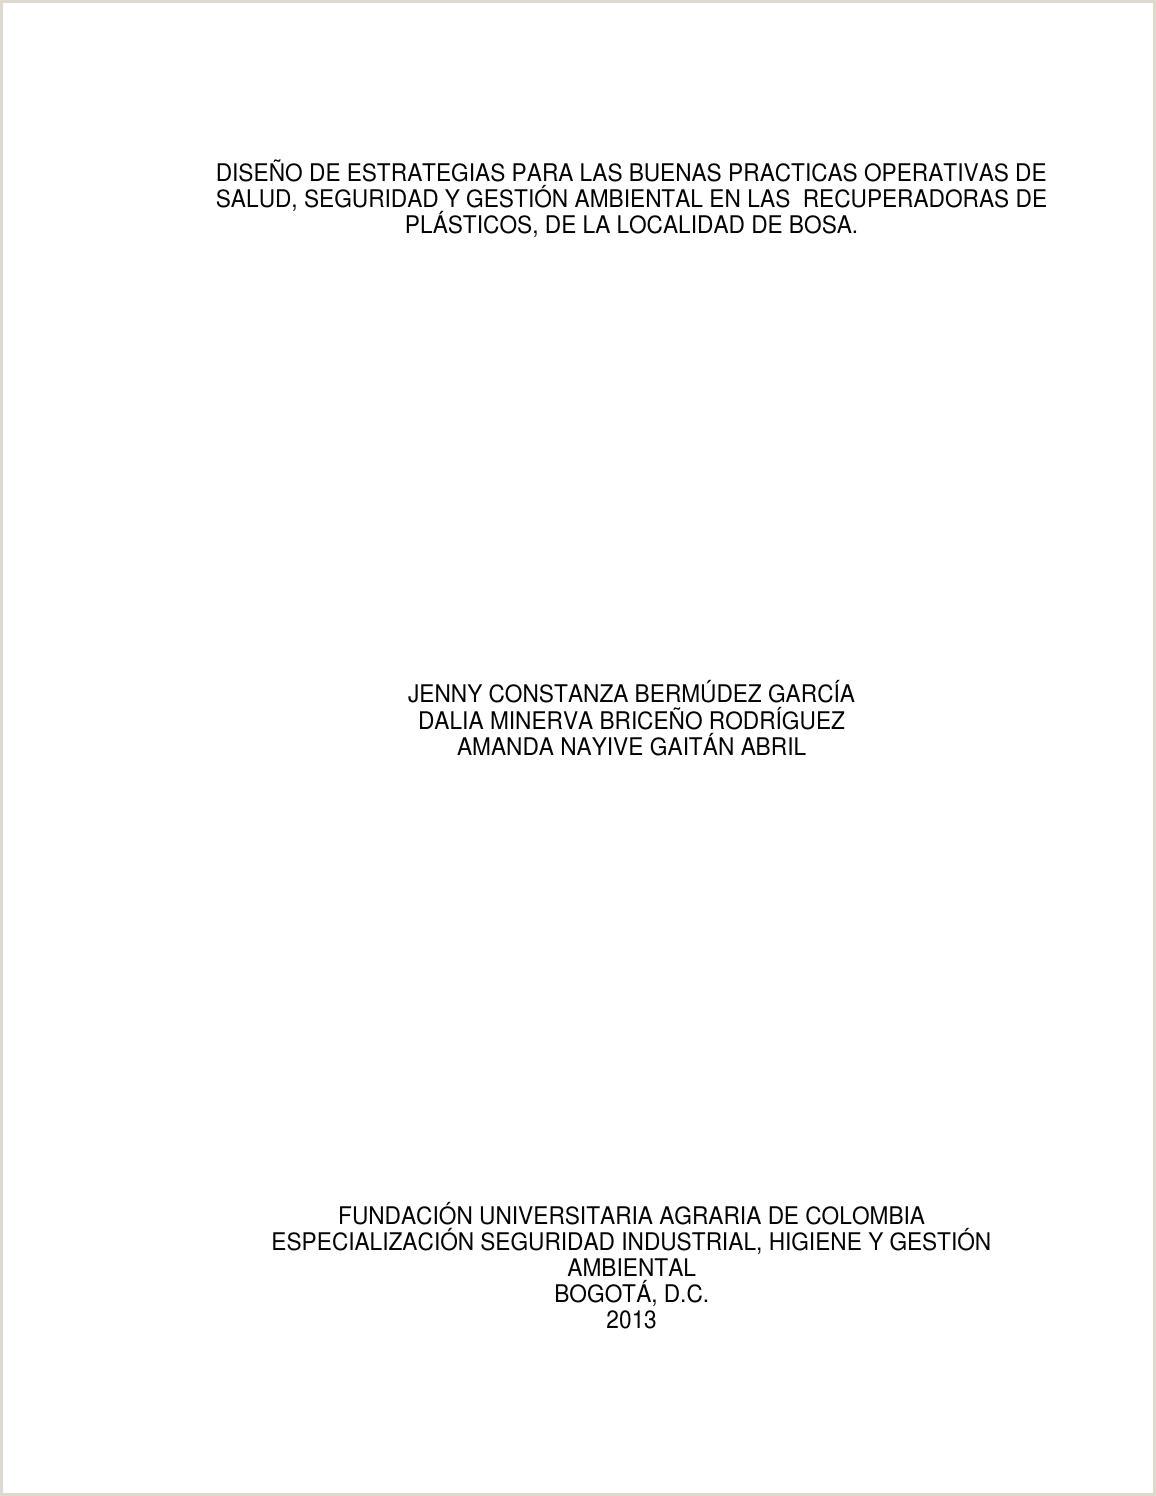 Formato Hoja De Vida Minerva Azul Tesis0492shg by Maosabo issuu